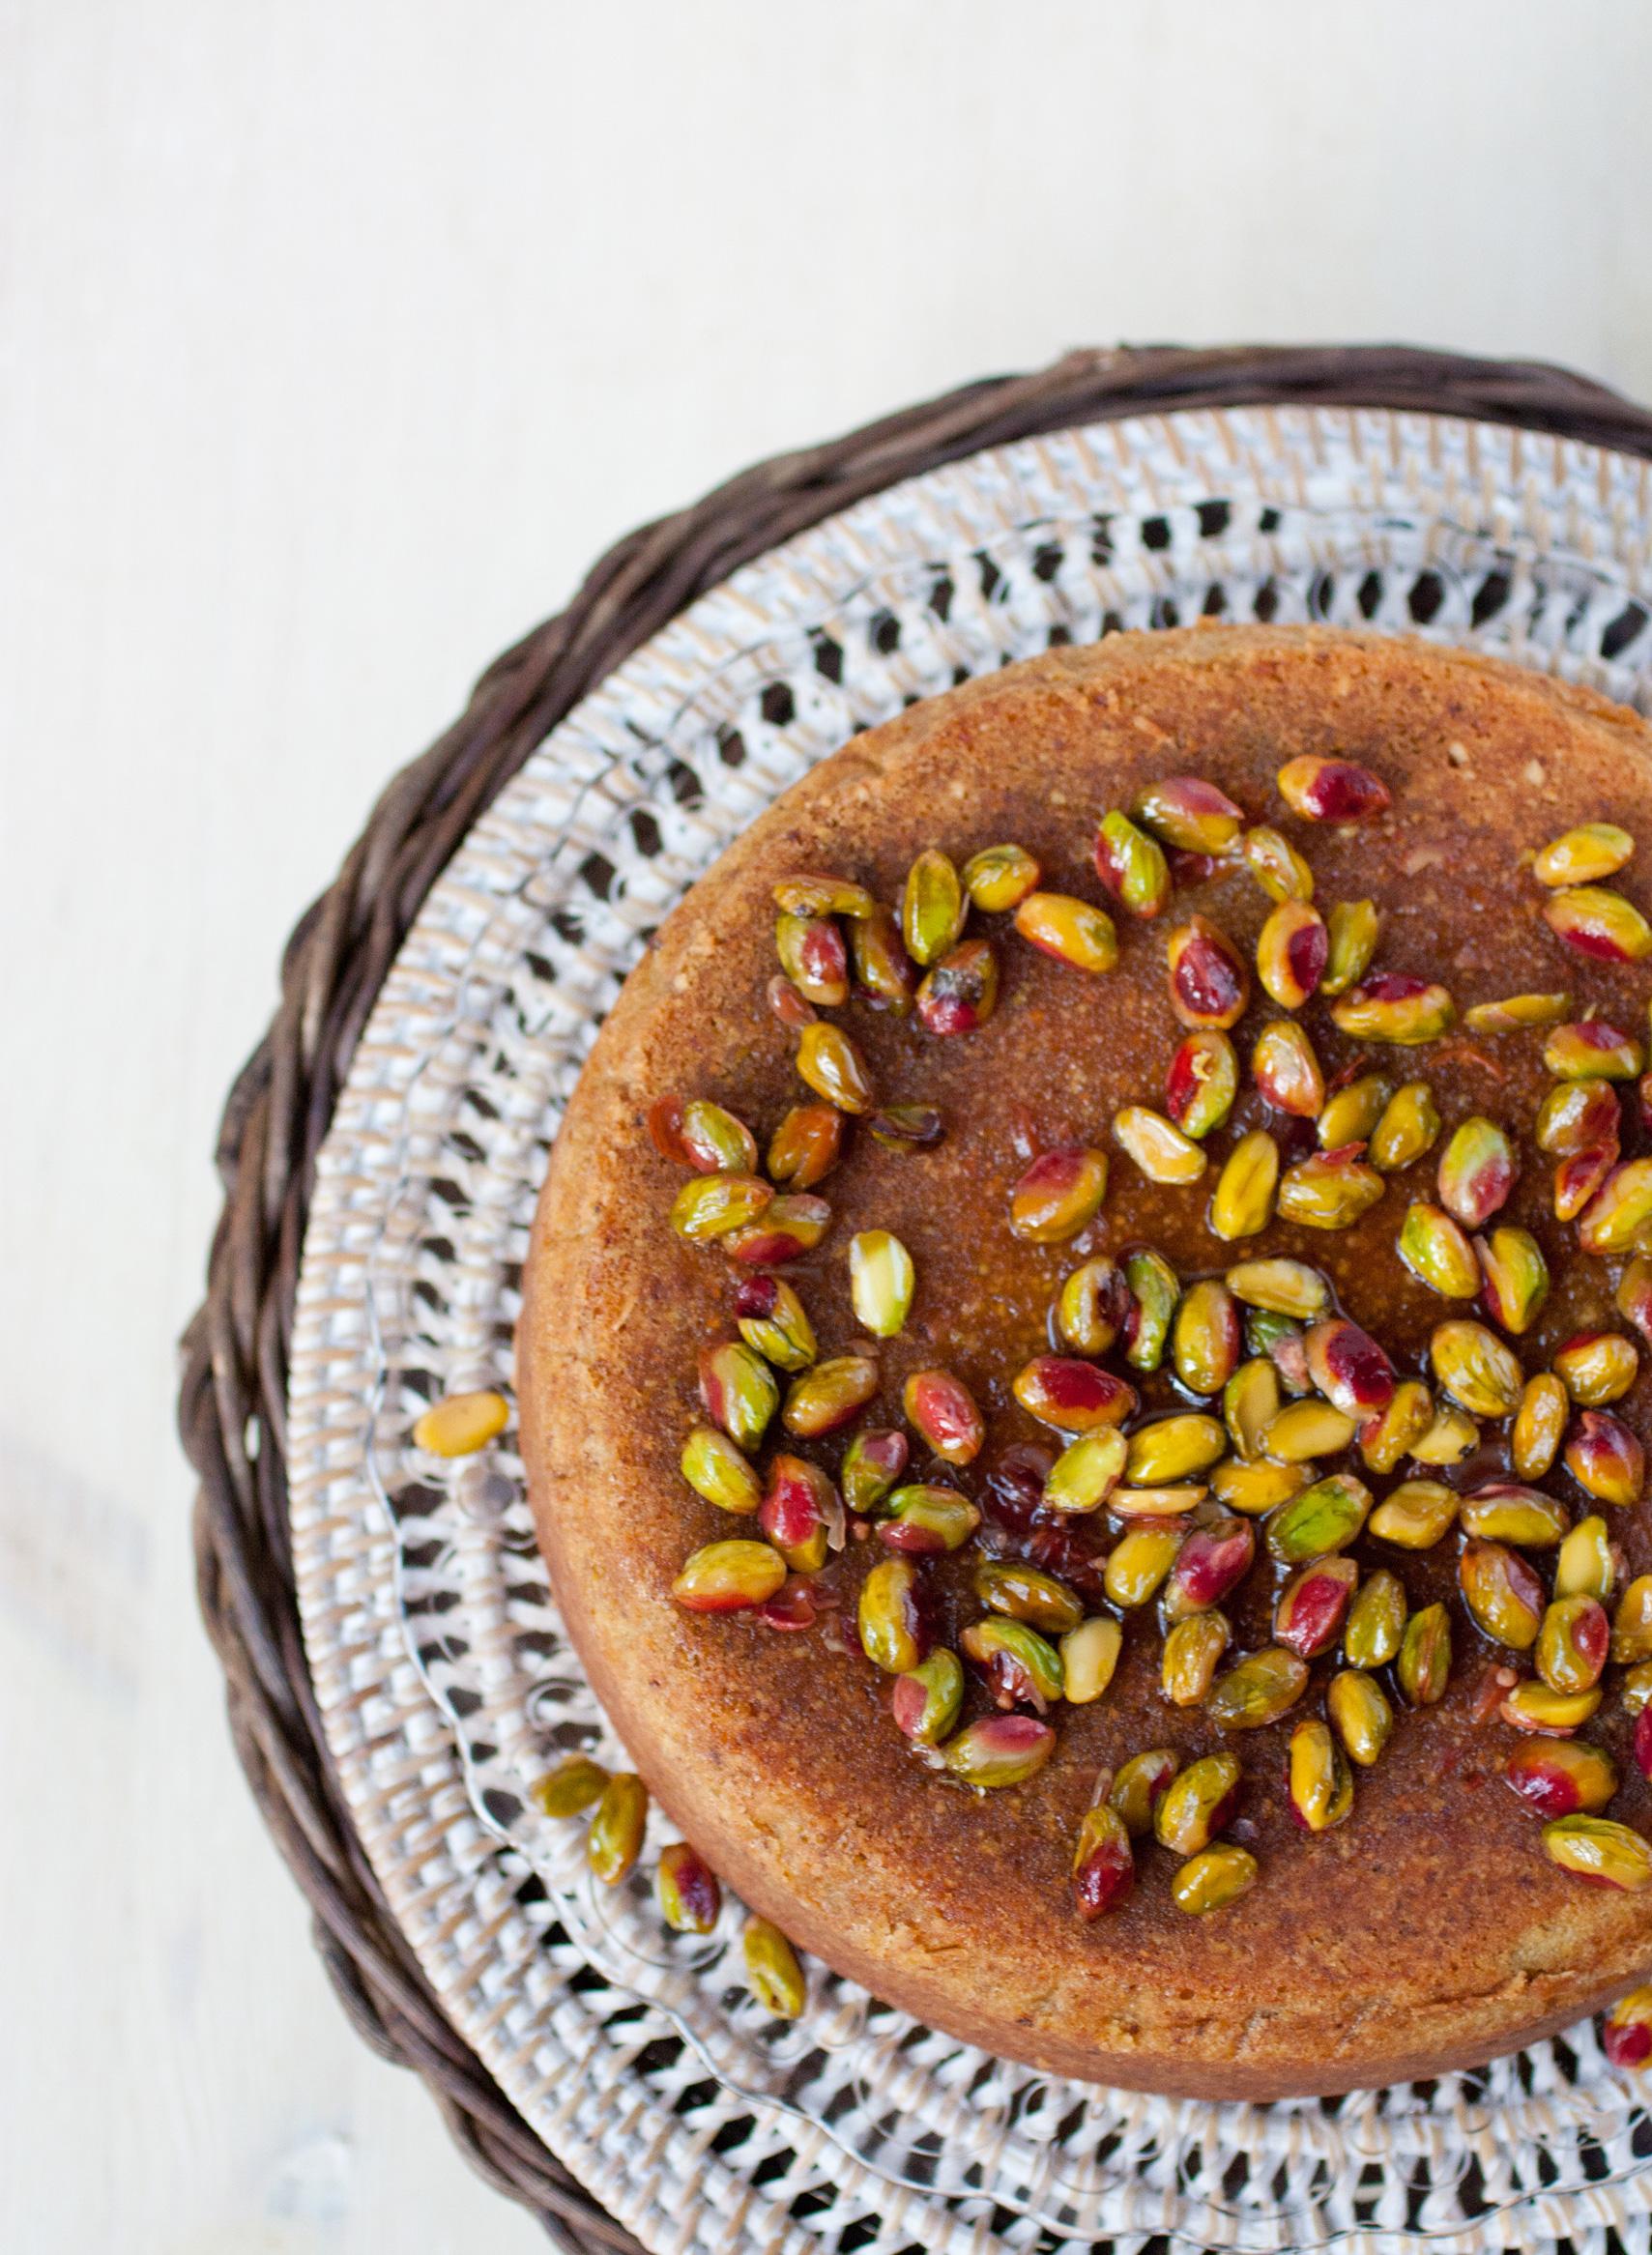 Lemon-Pistachio-Cake-3.jpg